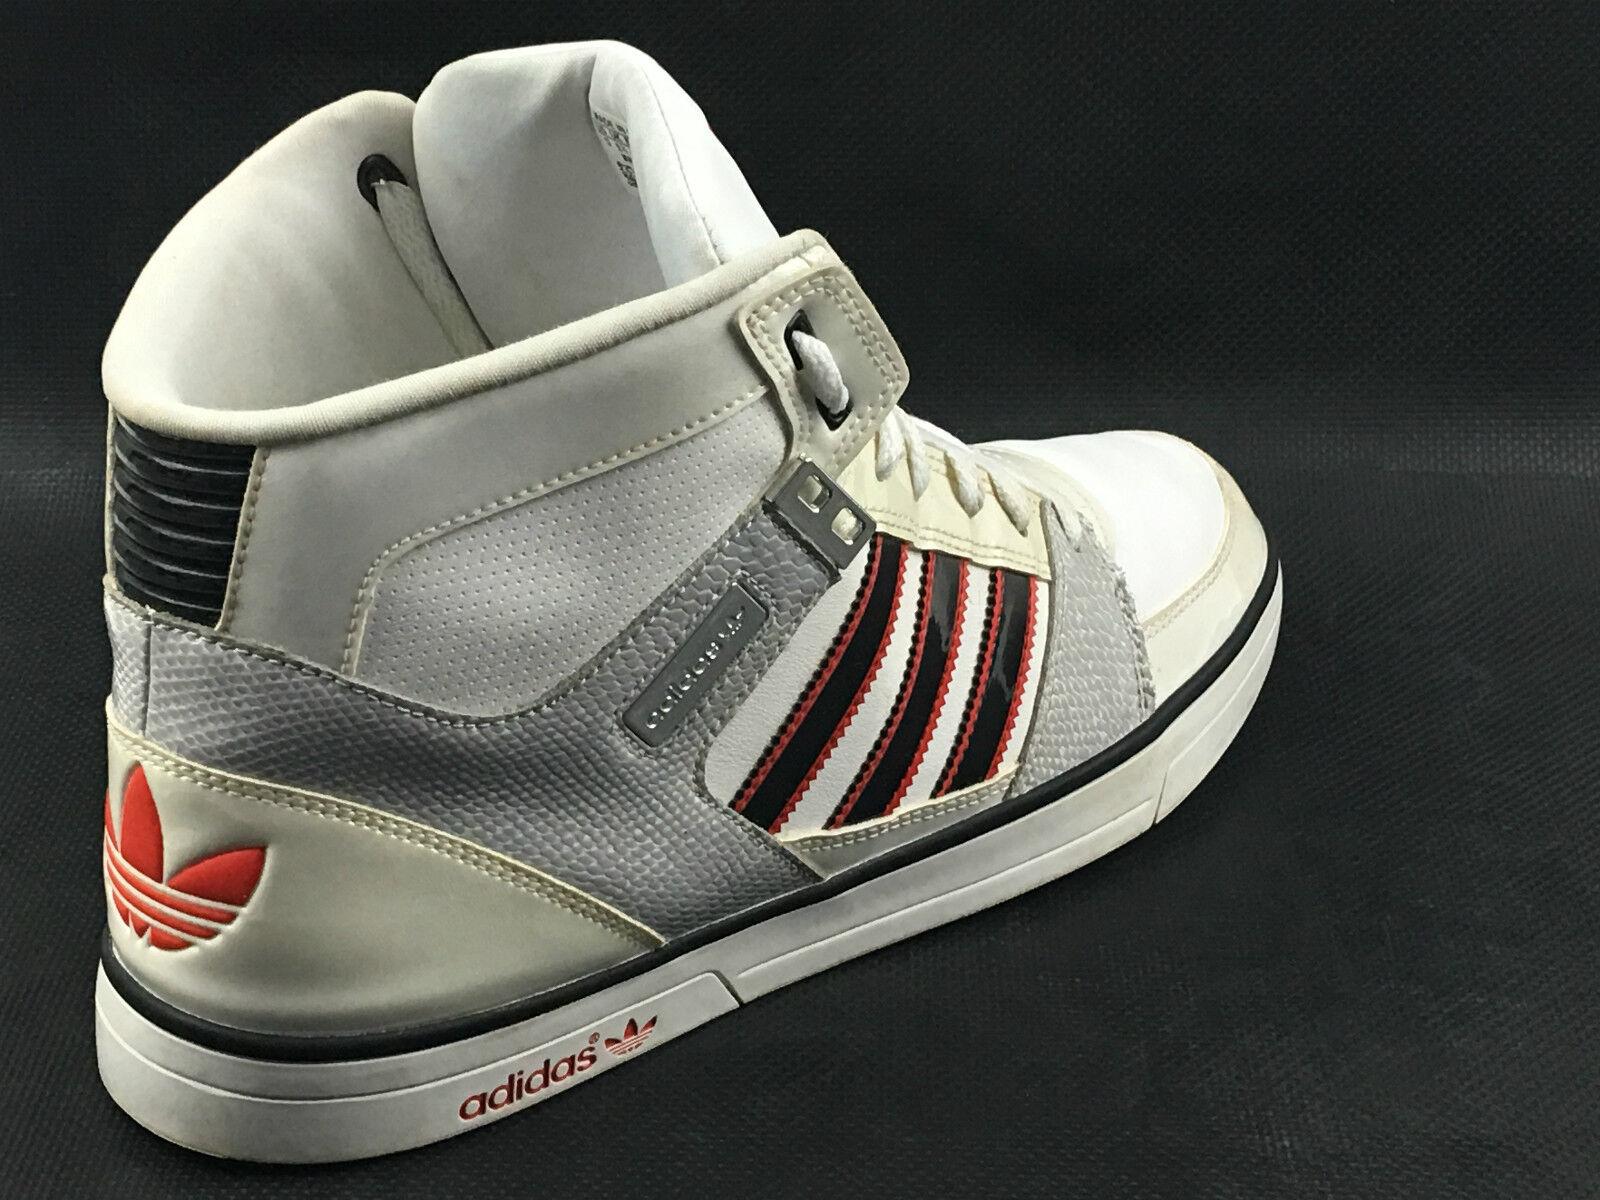 Adidas Hard Court HI II V21998  White /Gry /Blk.  Taglia 13 USA.